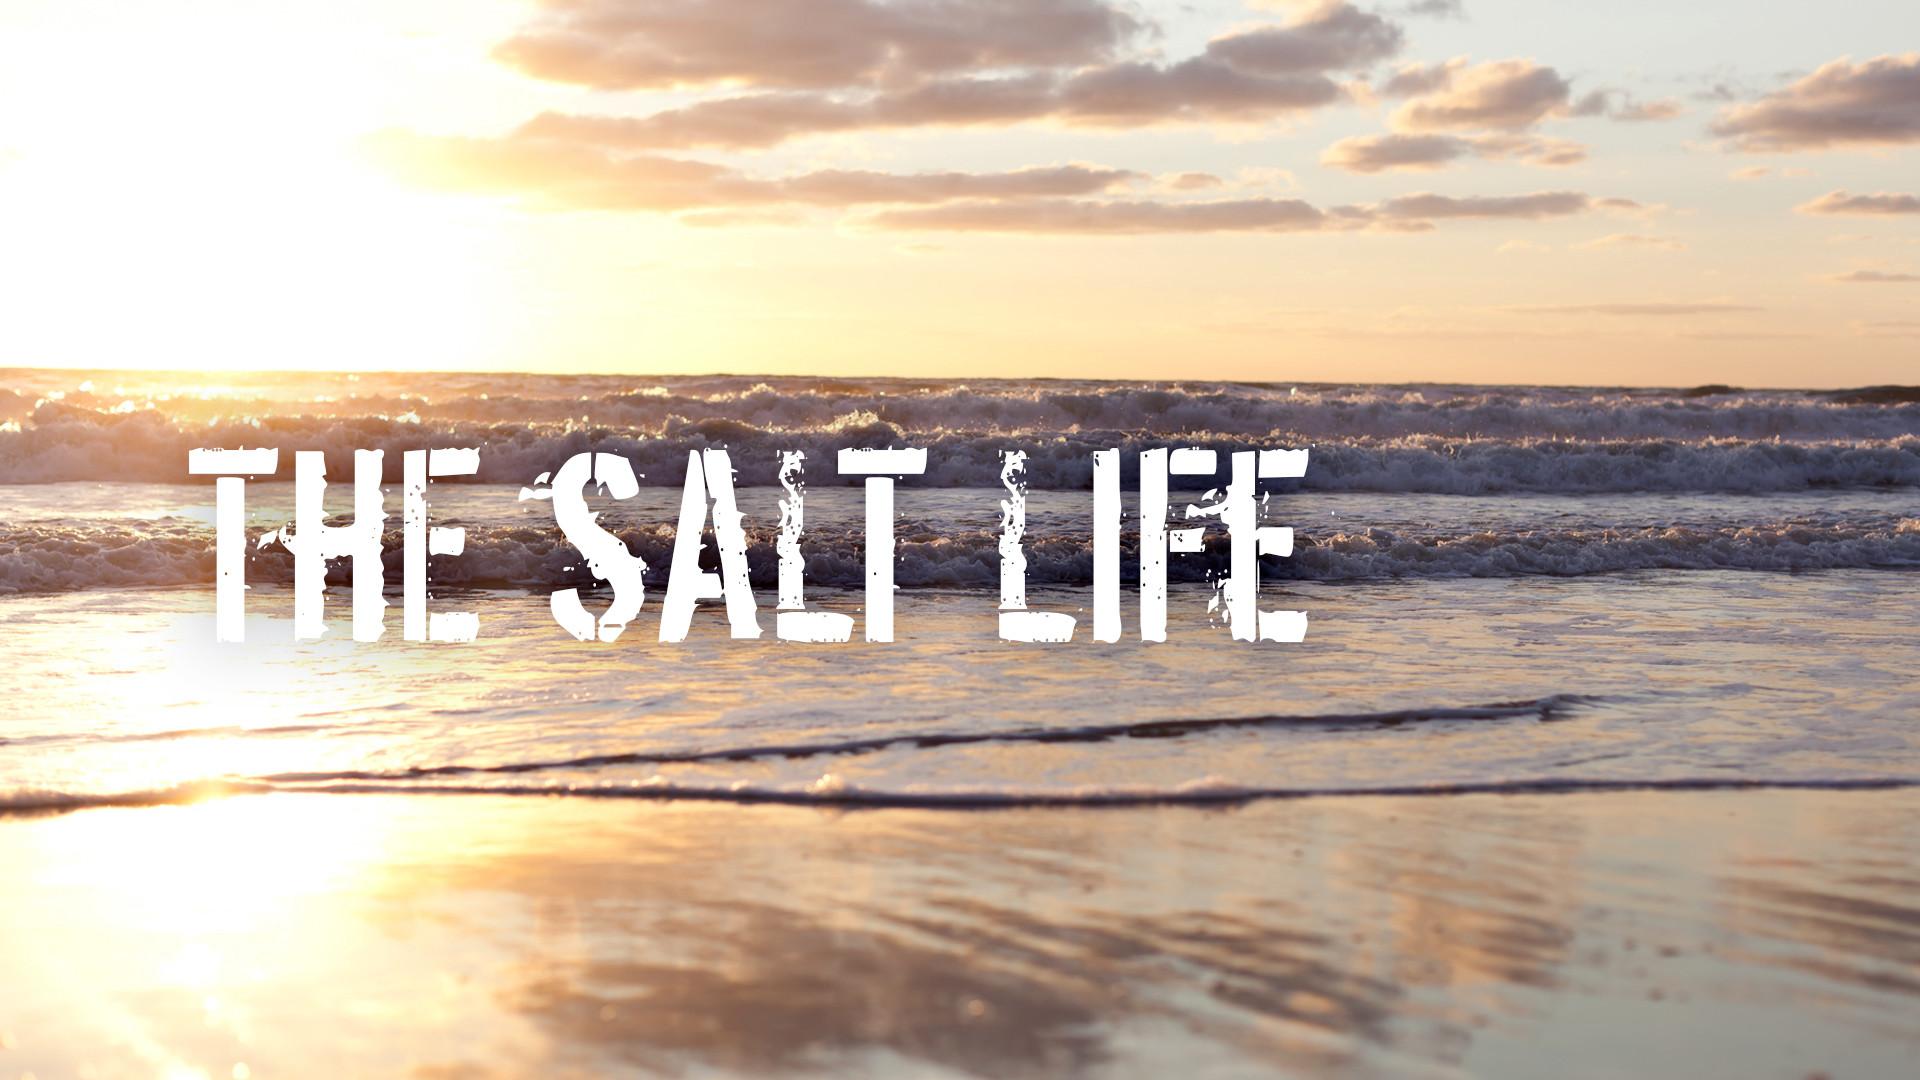 … salt life desktop background hd deskbg com; beaches wallpapers  …